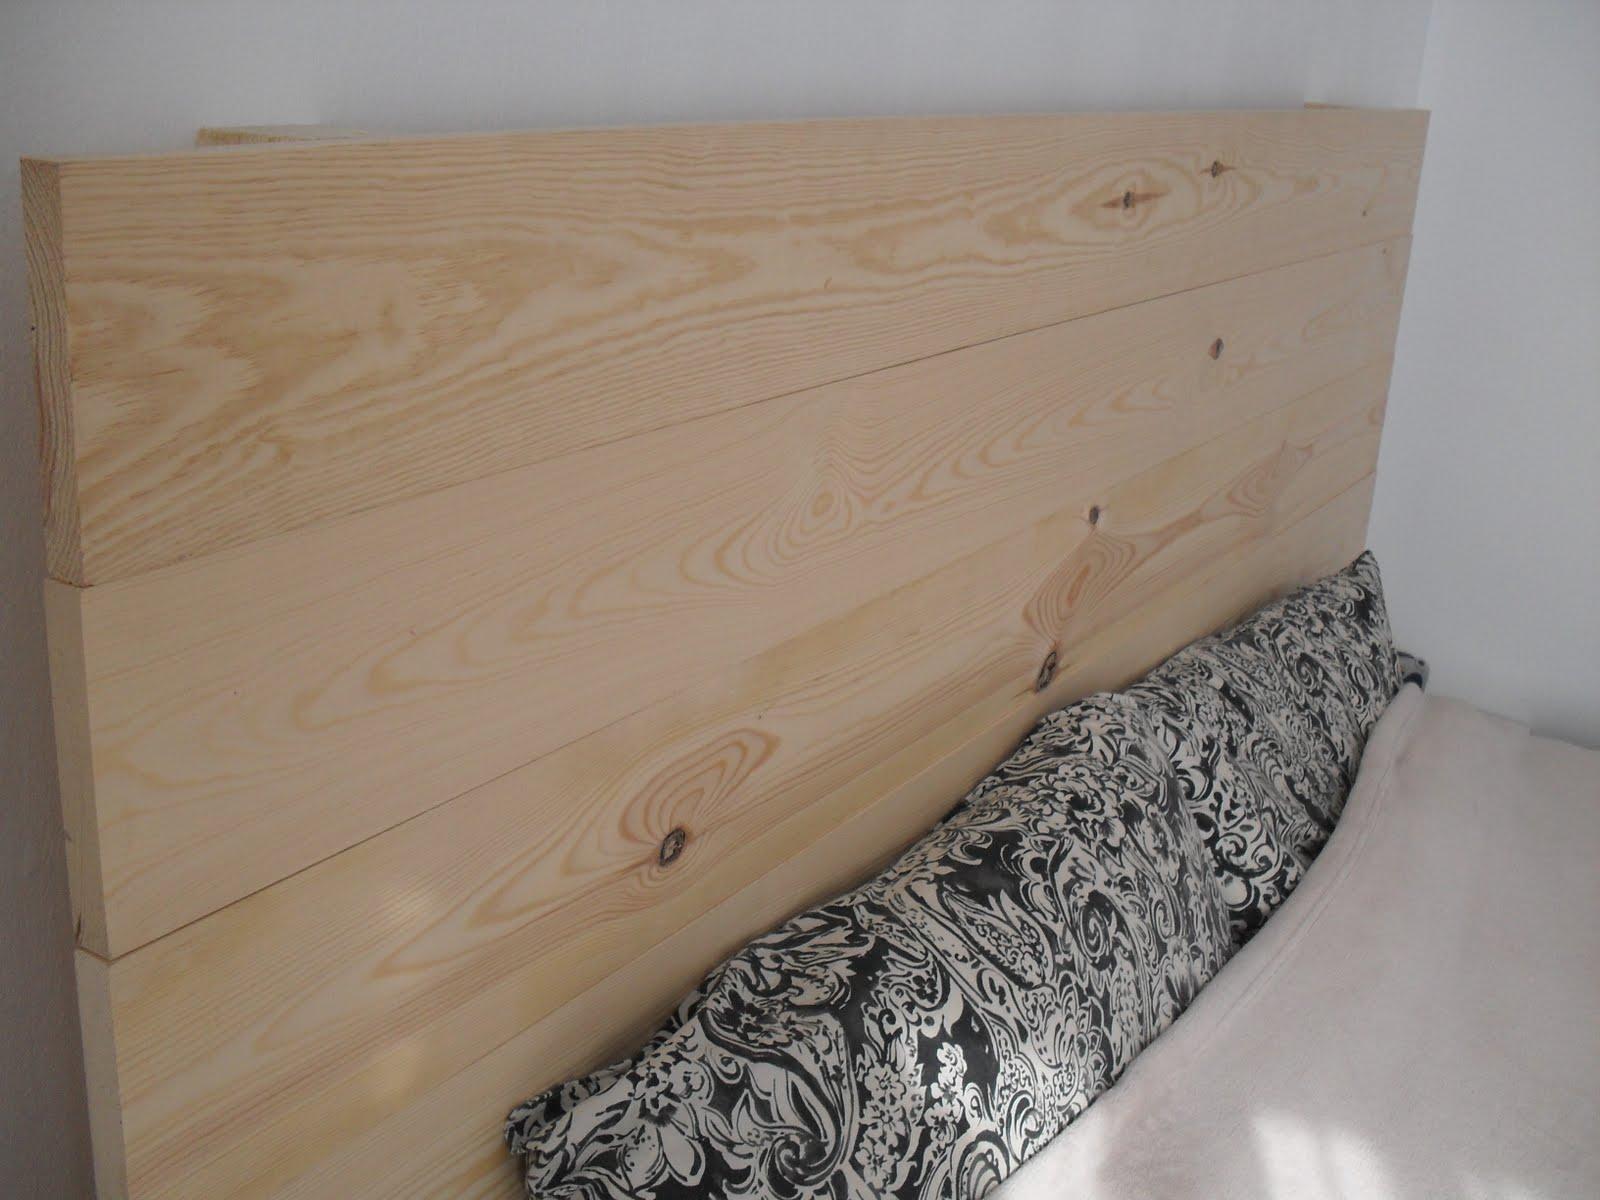 Cabezal de listones de madera lascafe - Cabezal de madera ...